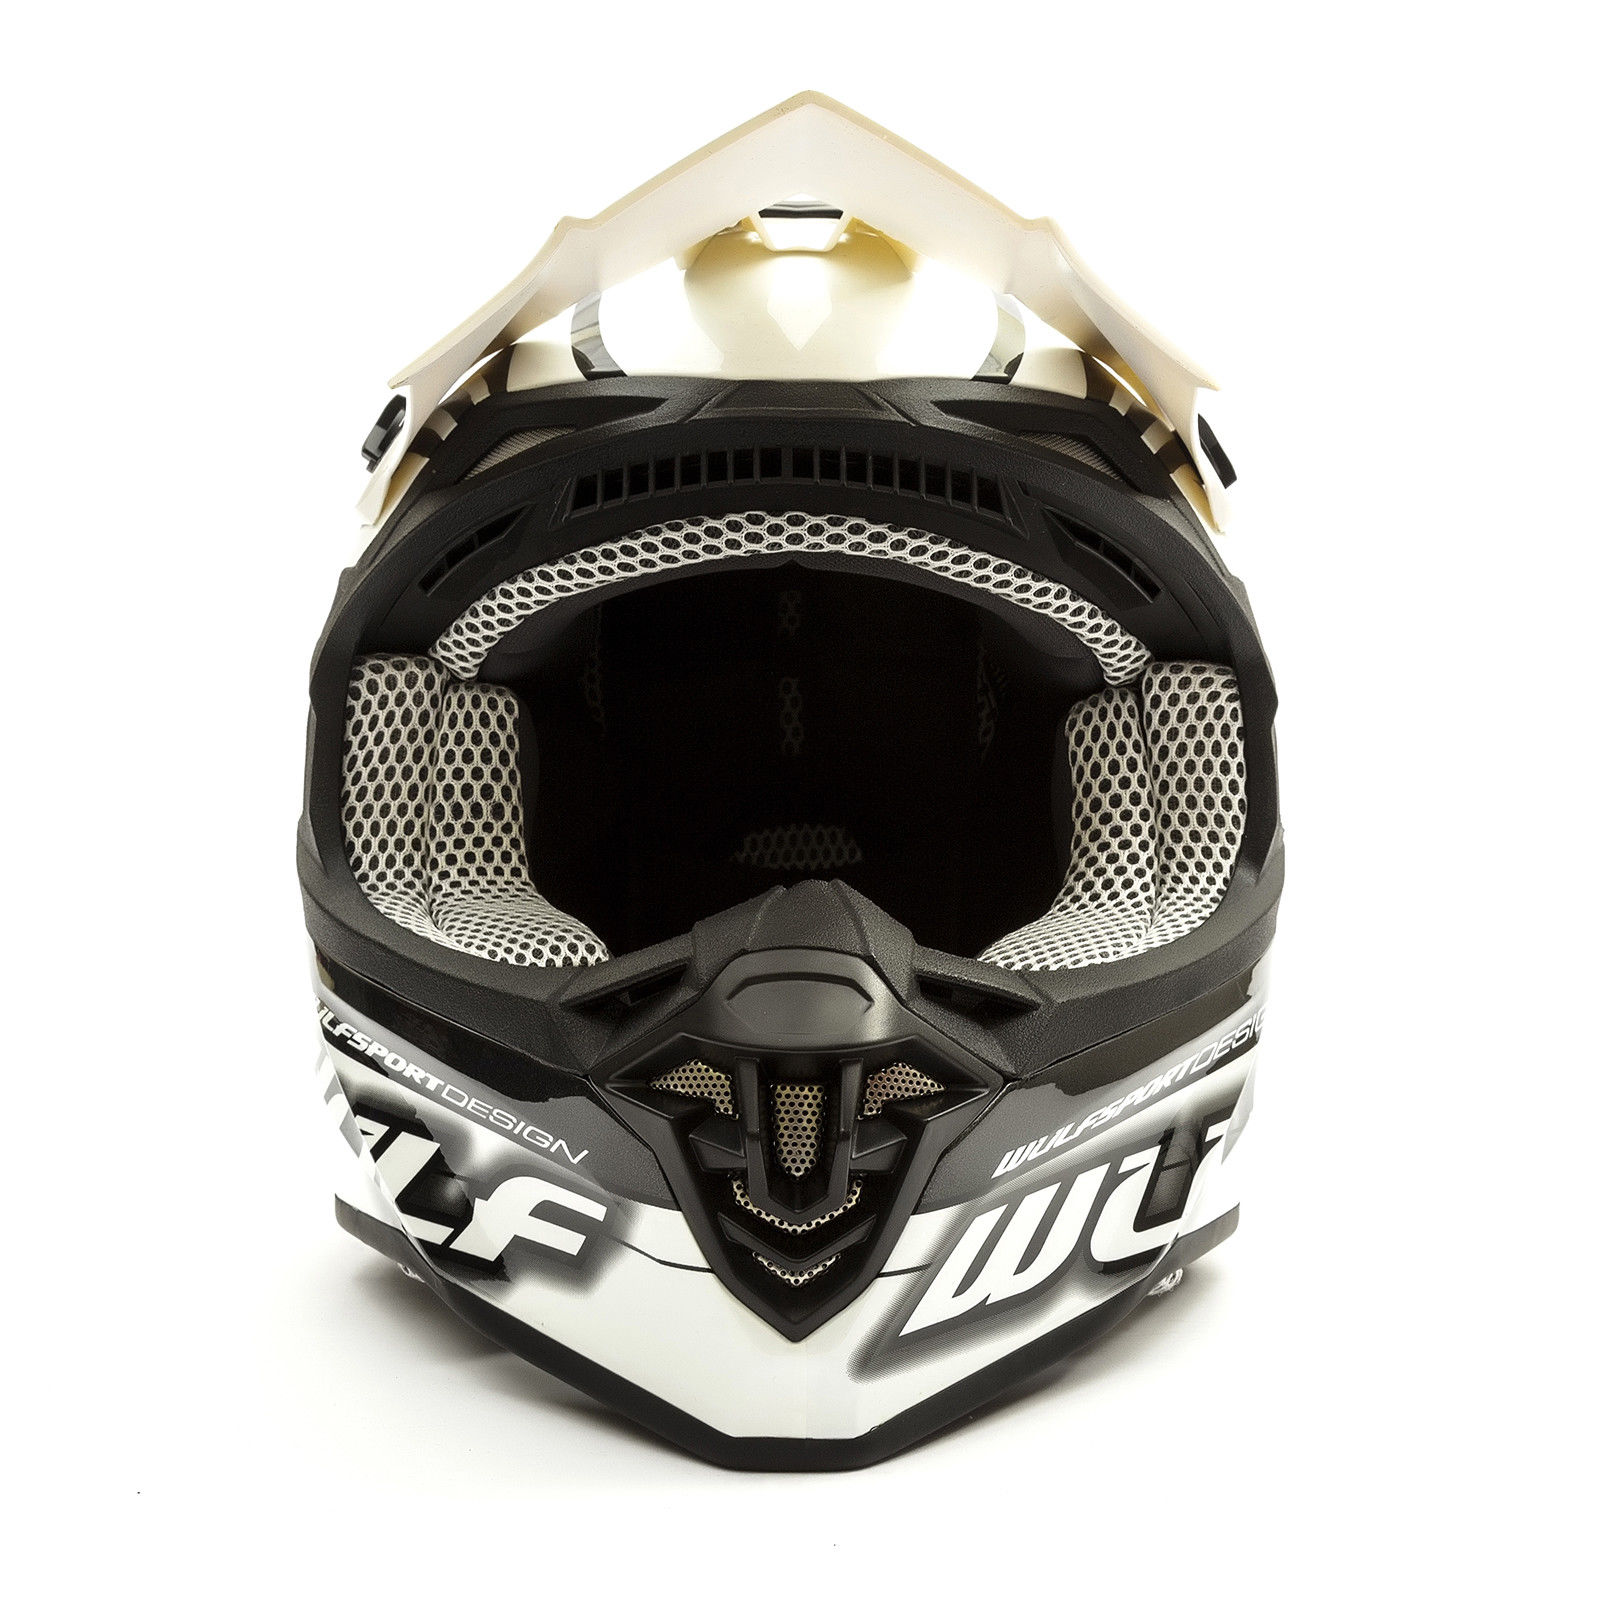 Wulfsport-Adult-Sceptre-Helmets-Motocross-Pitbike-Motorbike-Off-Road-Racing-ATV thumbnail 62